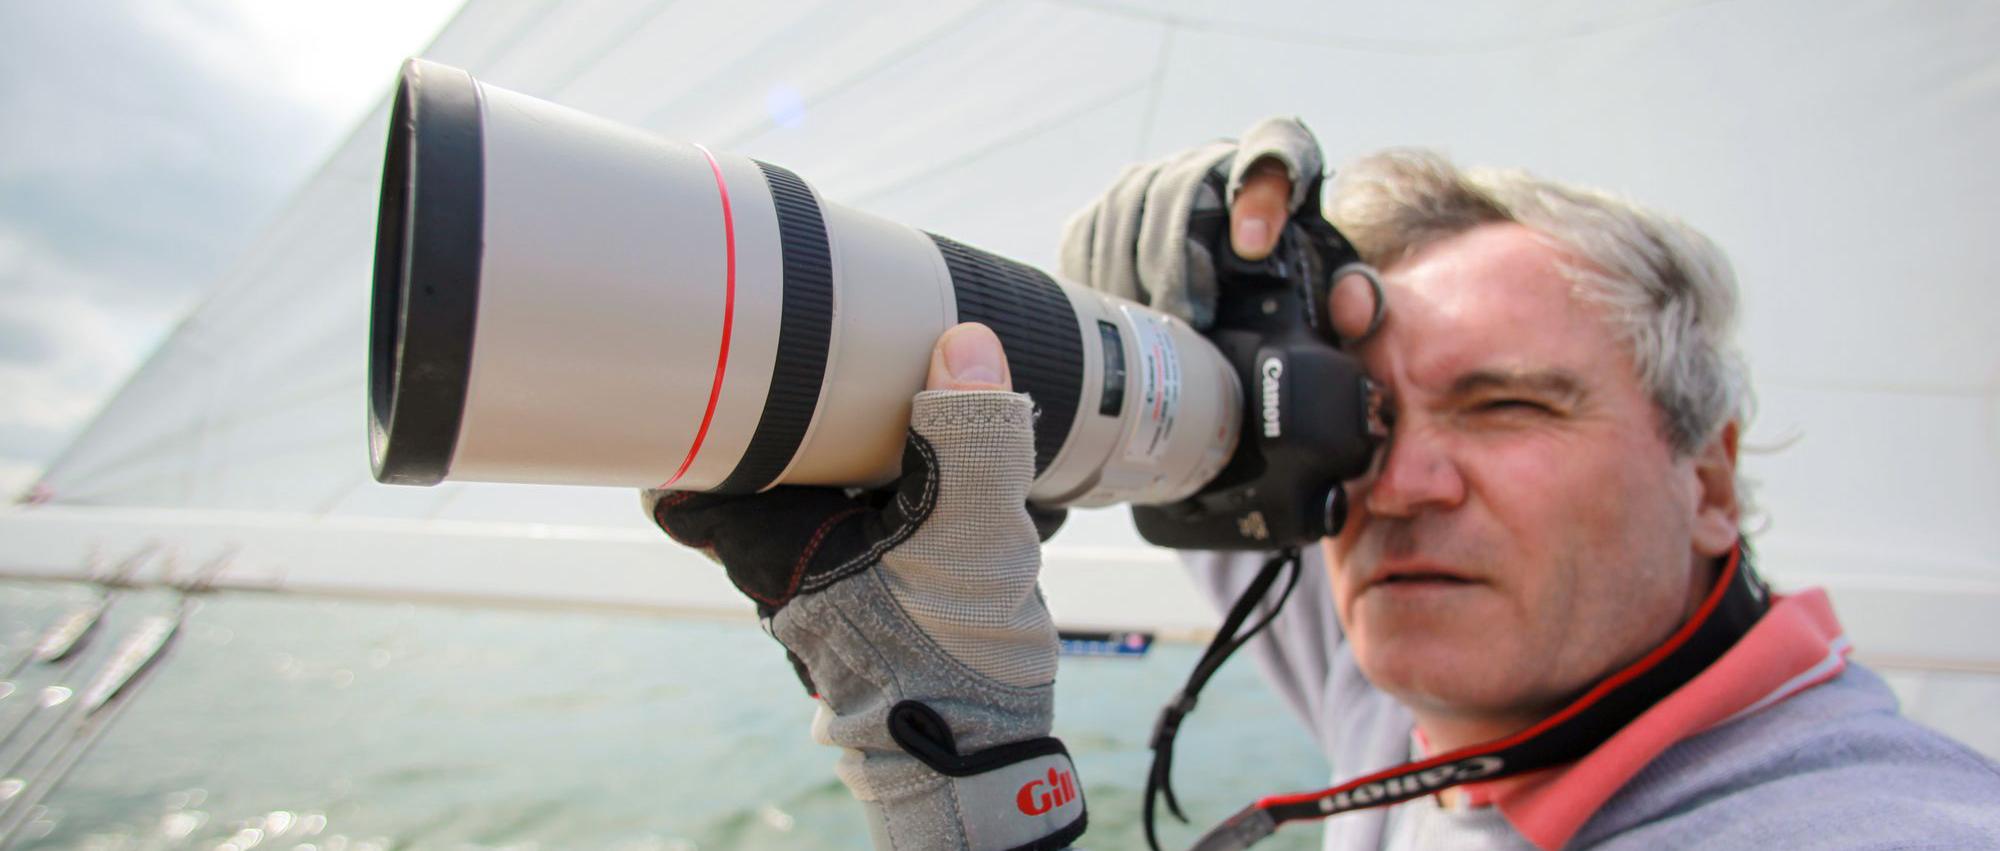 Fotograf Svend Krumnacker